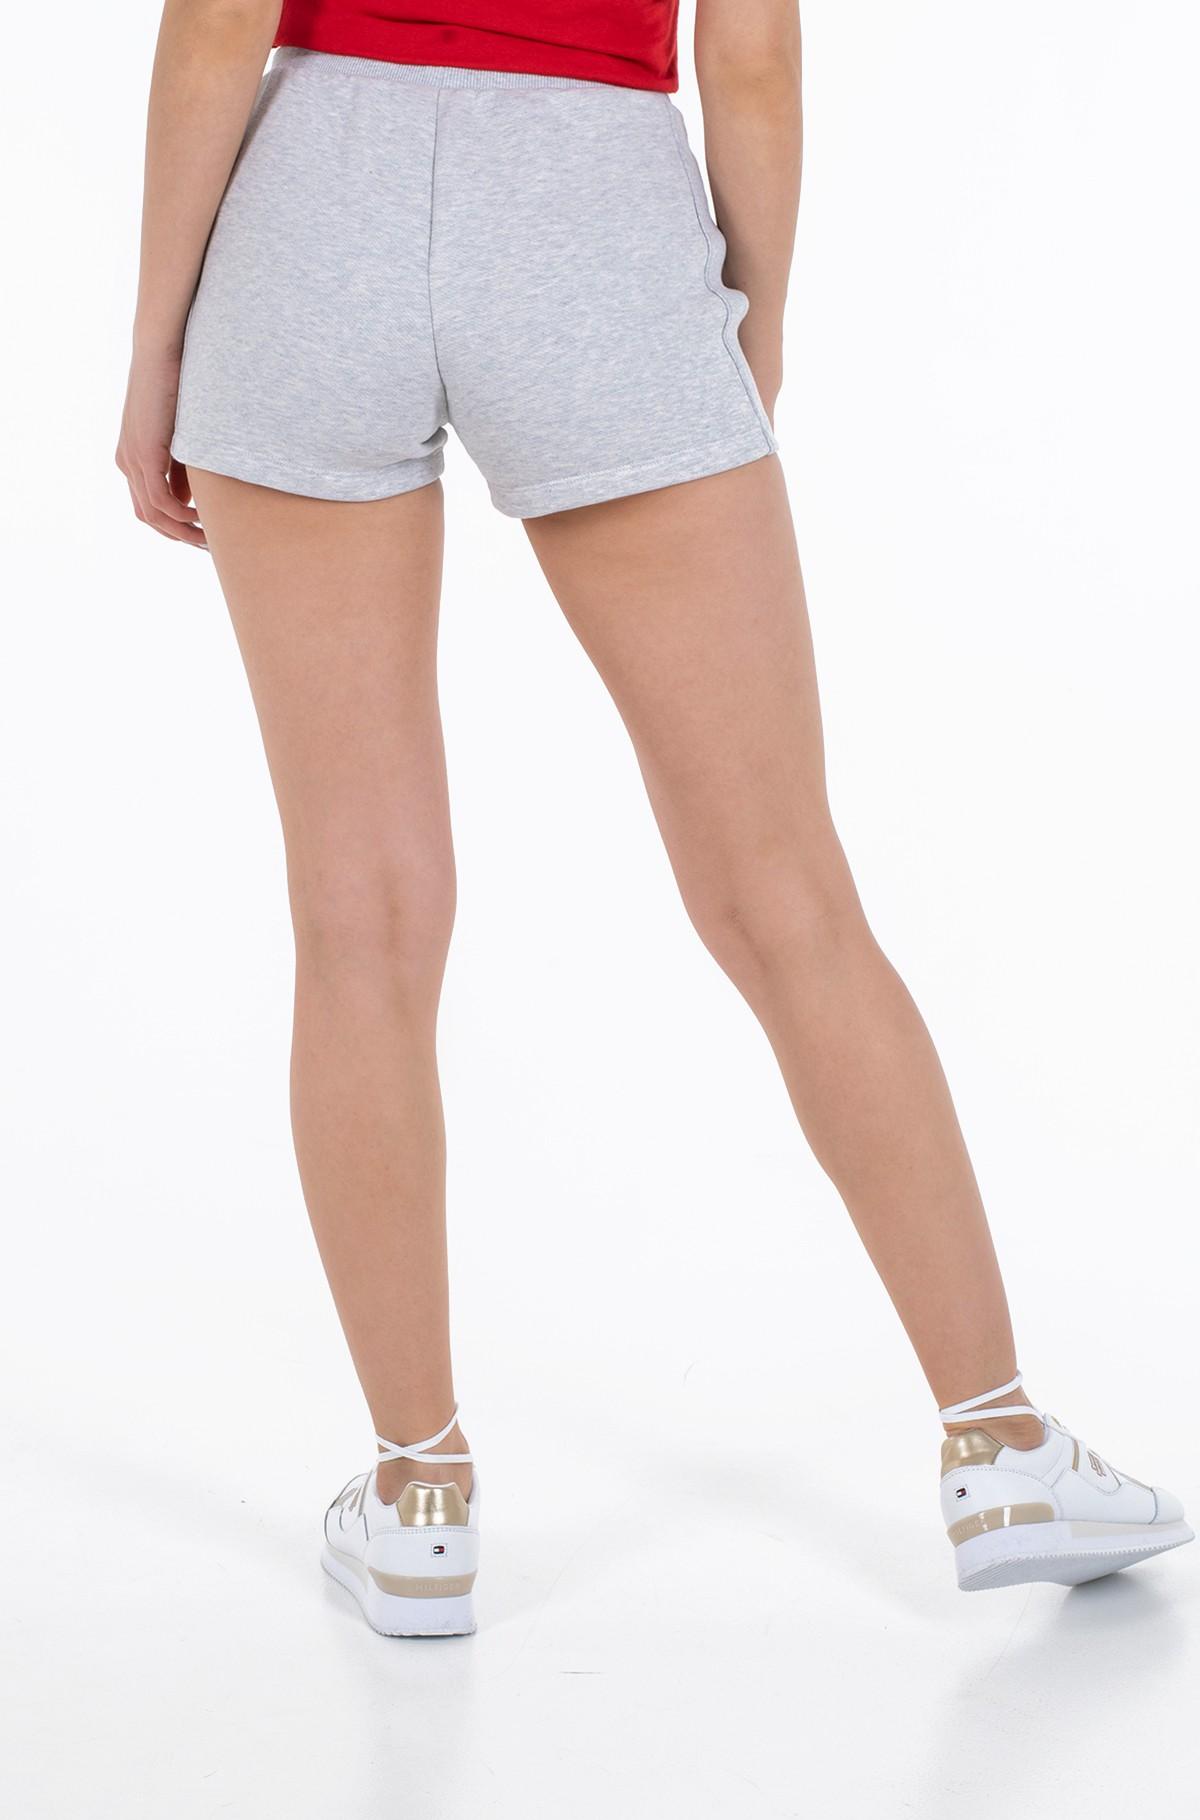 Short sports pants TJW TOMMY BADGE SWEATSHORT-full-2